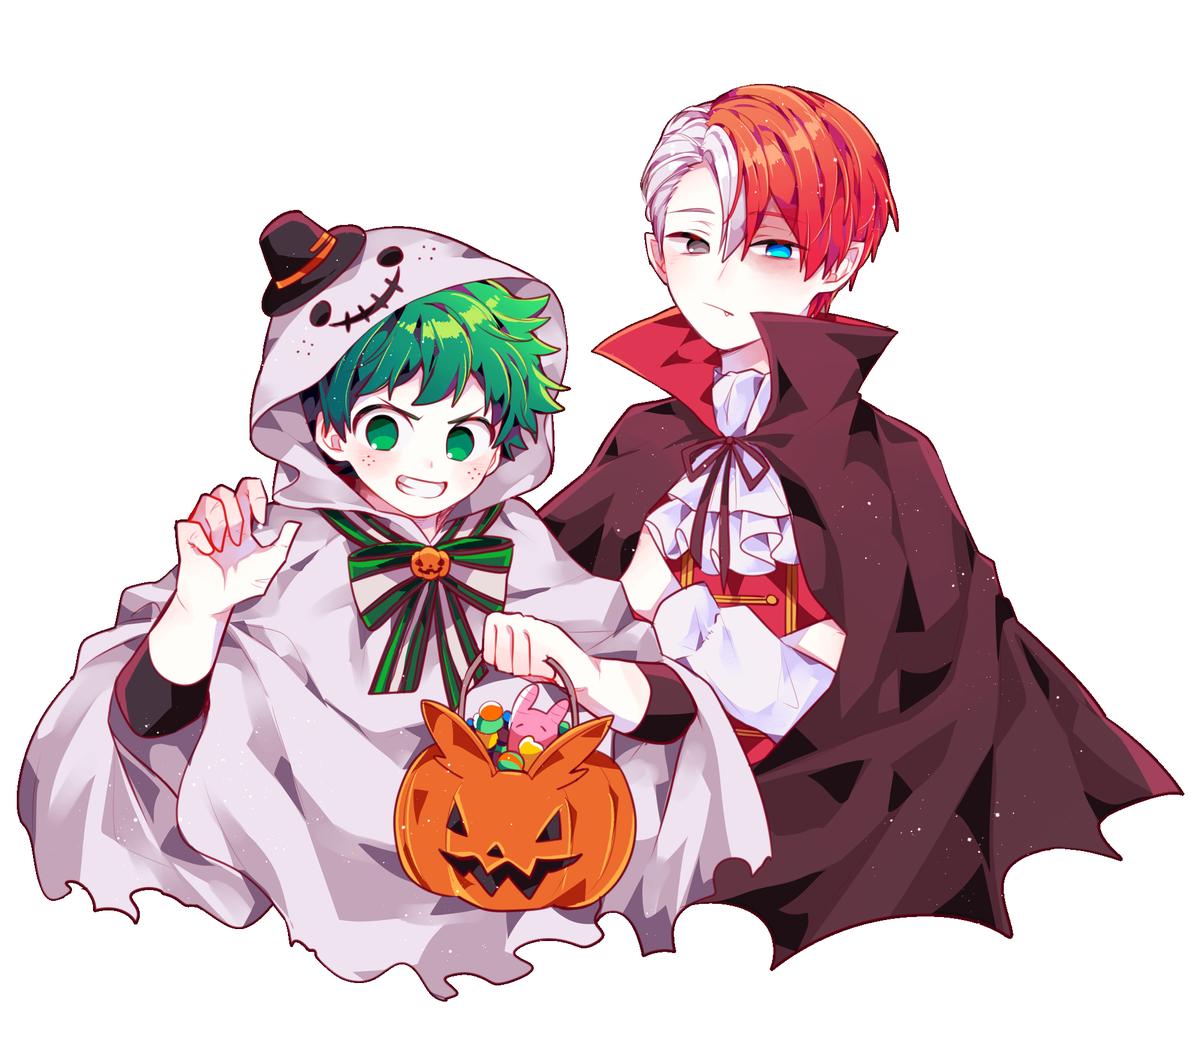 Todoroki Shouto Midoriya Izuku My Hero Academia Episodes Anime Halloween Hero Wallpaper